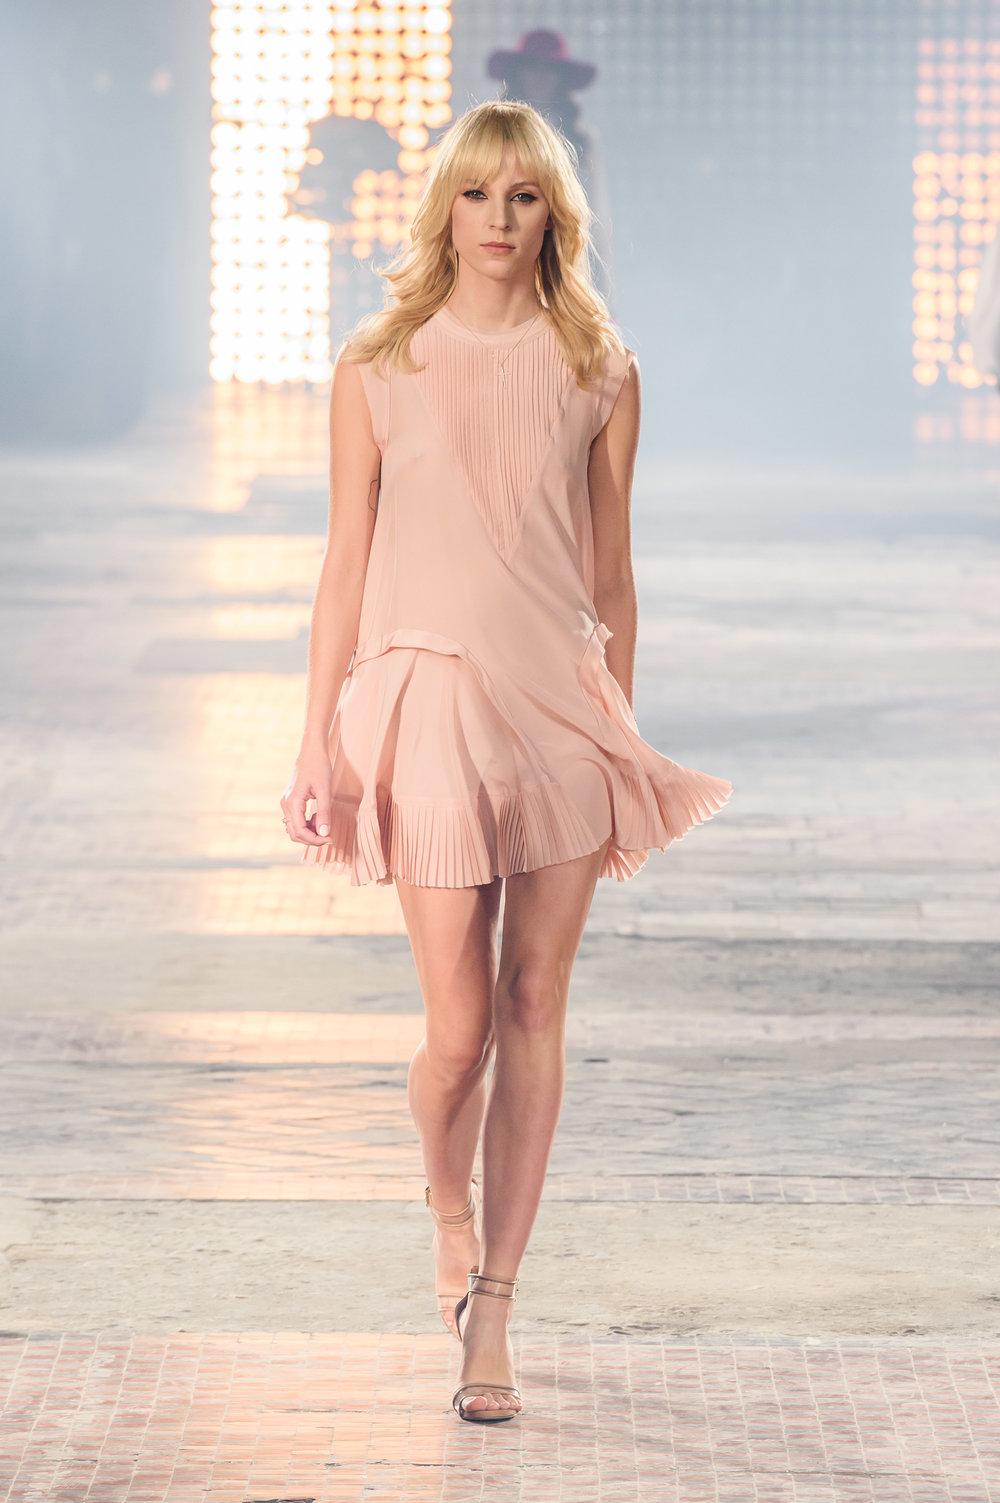 10_MaciejZien_271018_highres-fotFilipOkopny-FashionImages.JPG